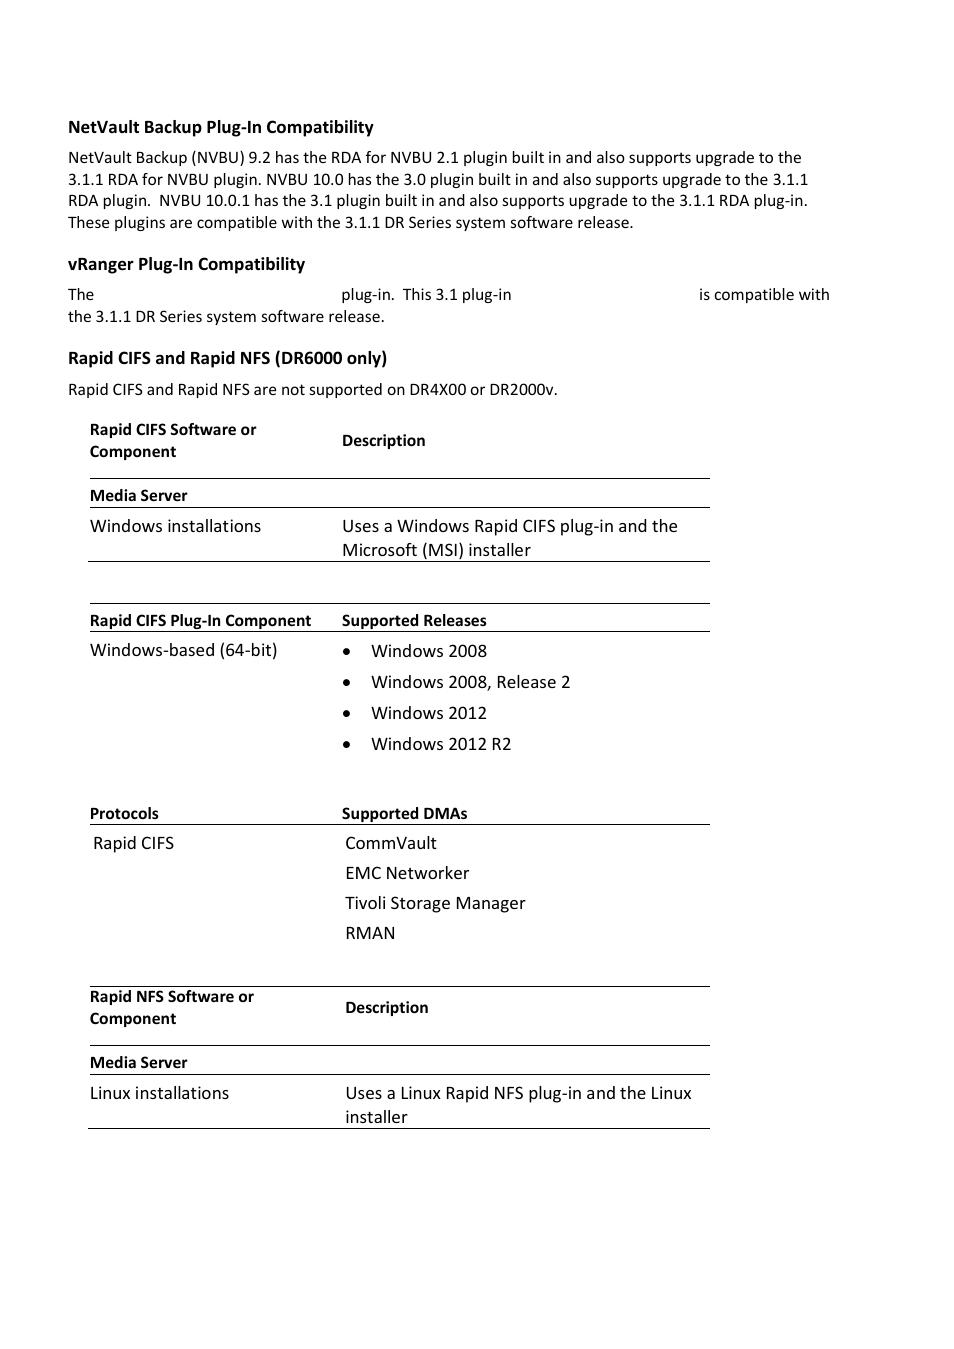 netvault backup plug in compatibility vranger plug in compatibility rh manualsdir com User Webcast Kindle Fire User Guide